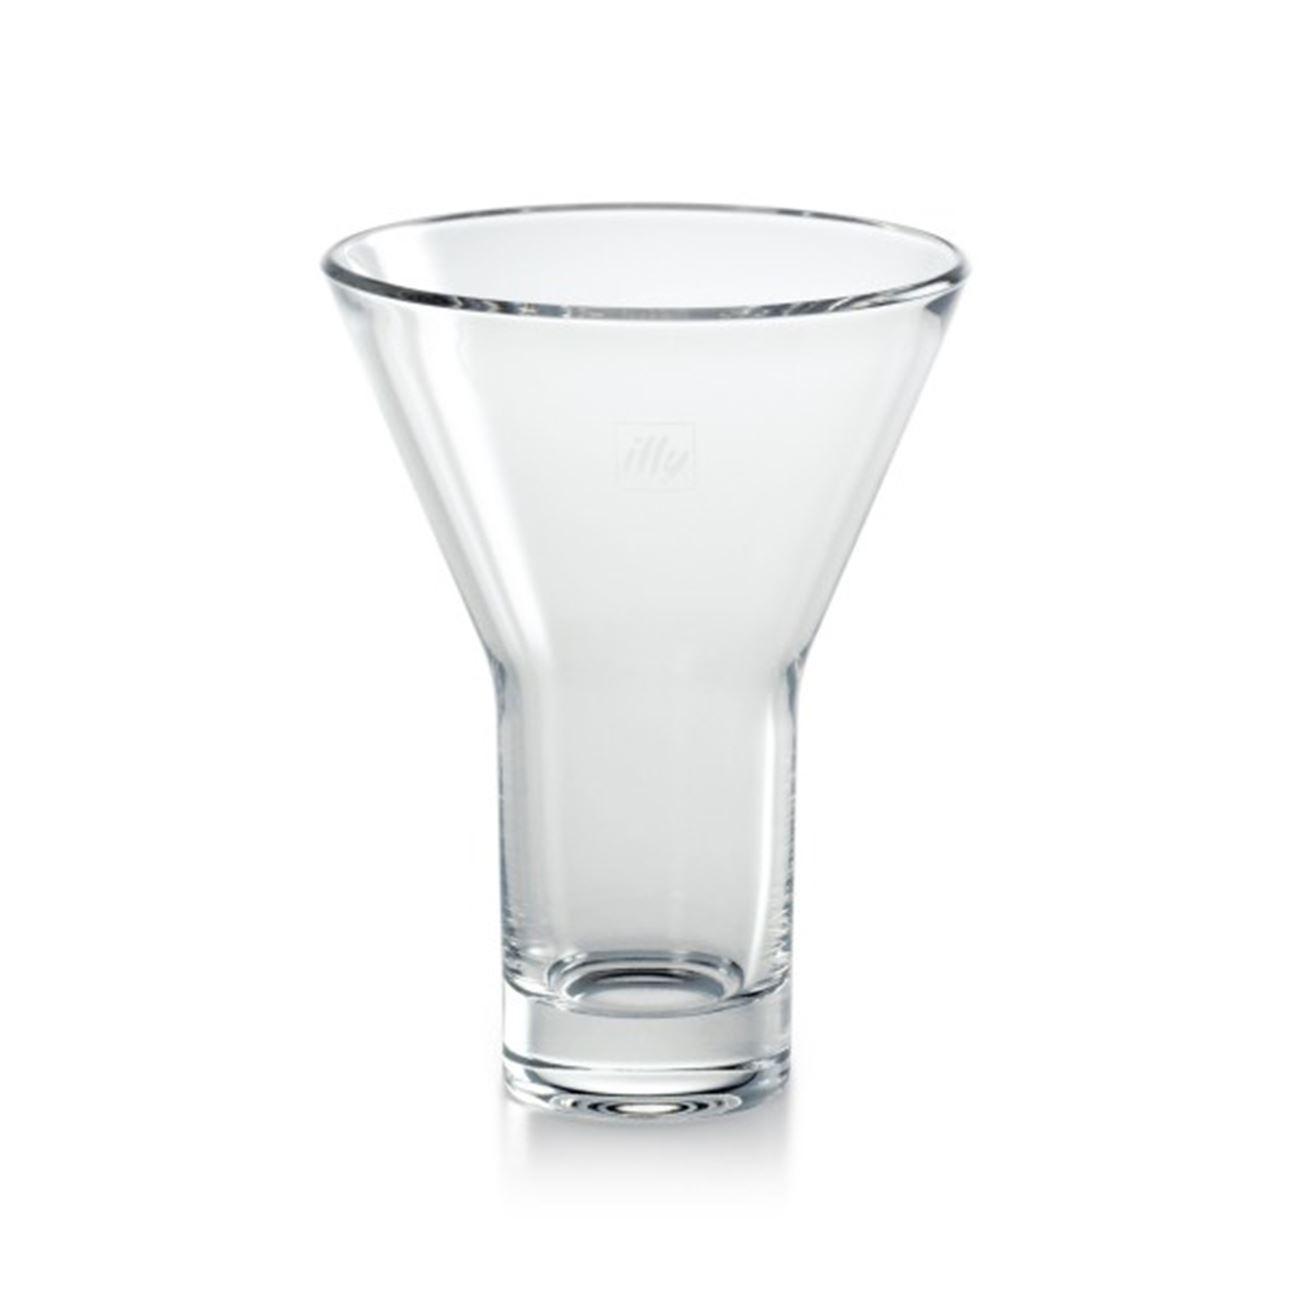 illy Freddo Espresso glasses